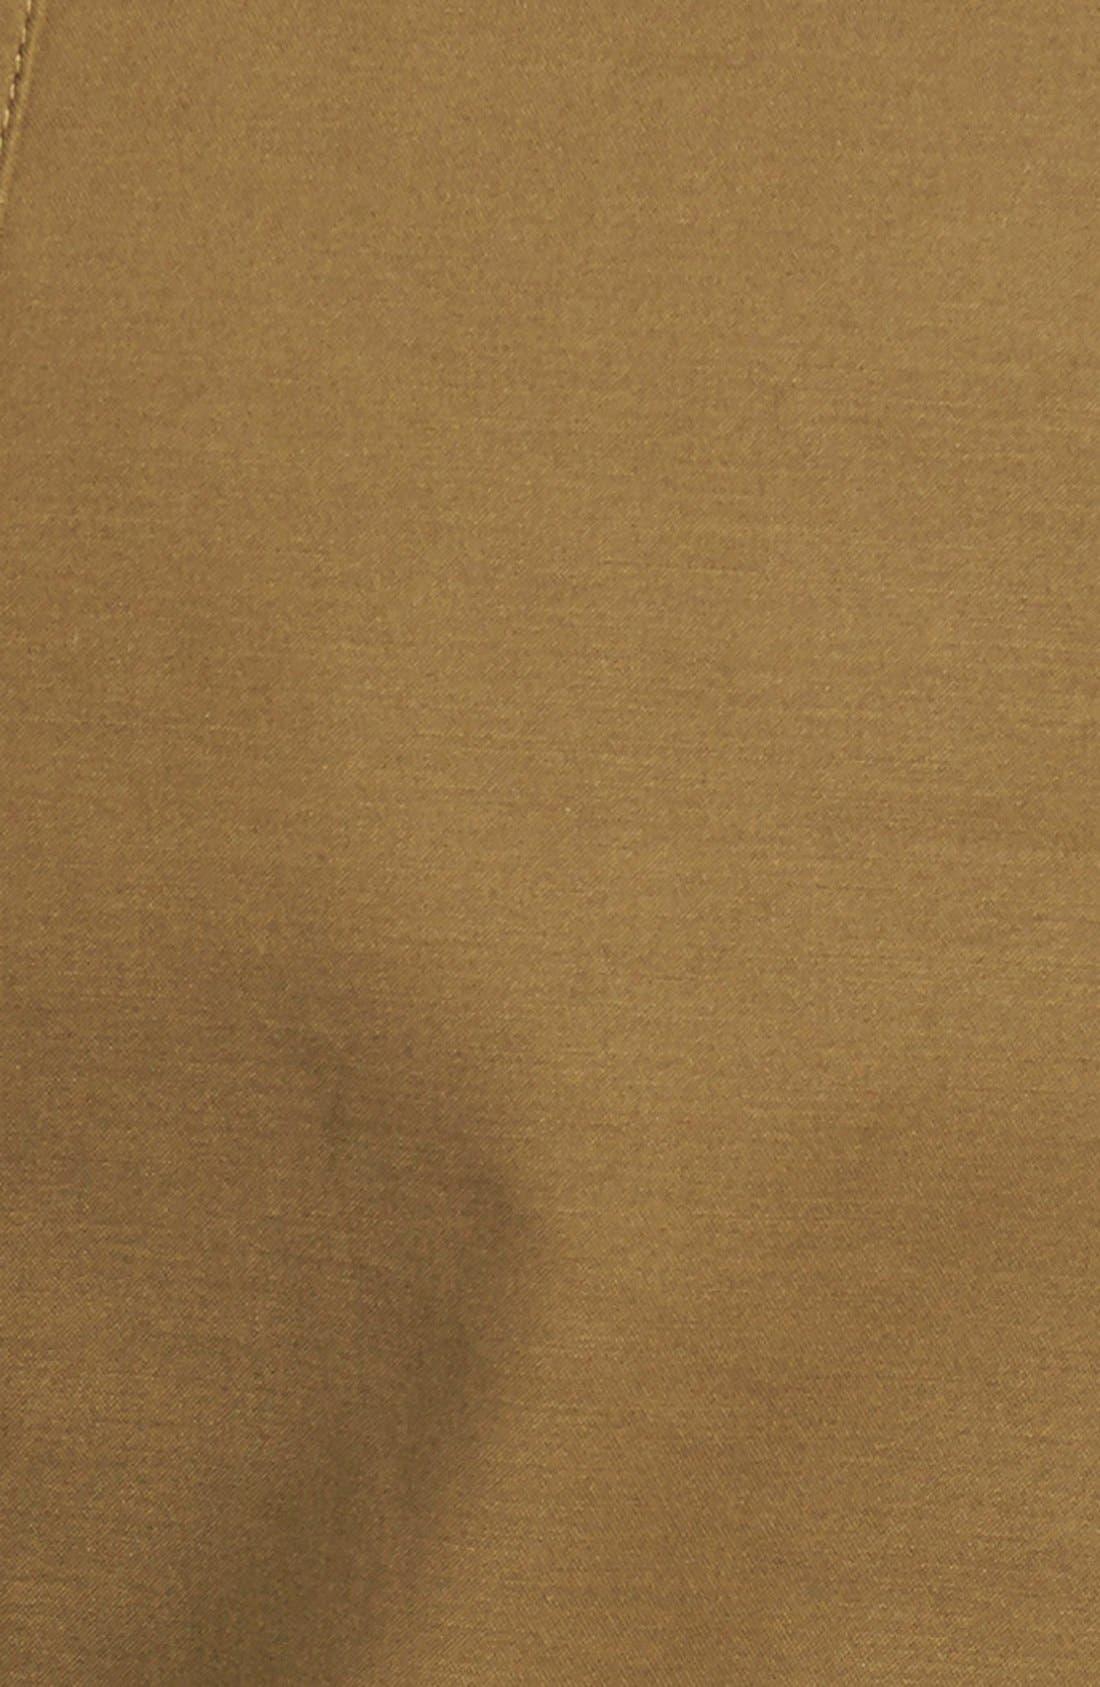 Alternate Image 3  - MICHAEL Michael Kors Paneled Utility Jacket (Regular & Petite)